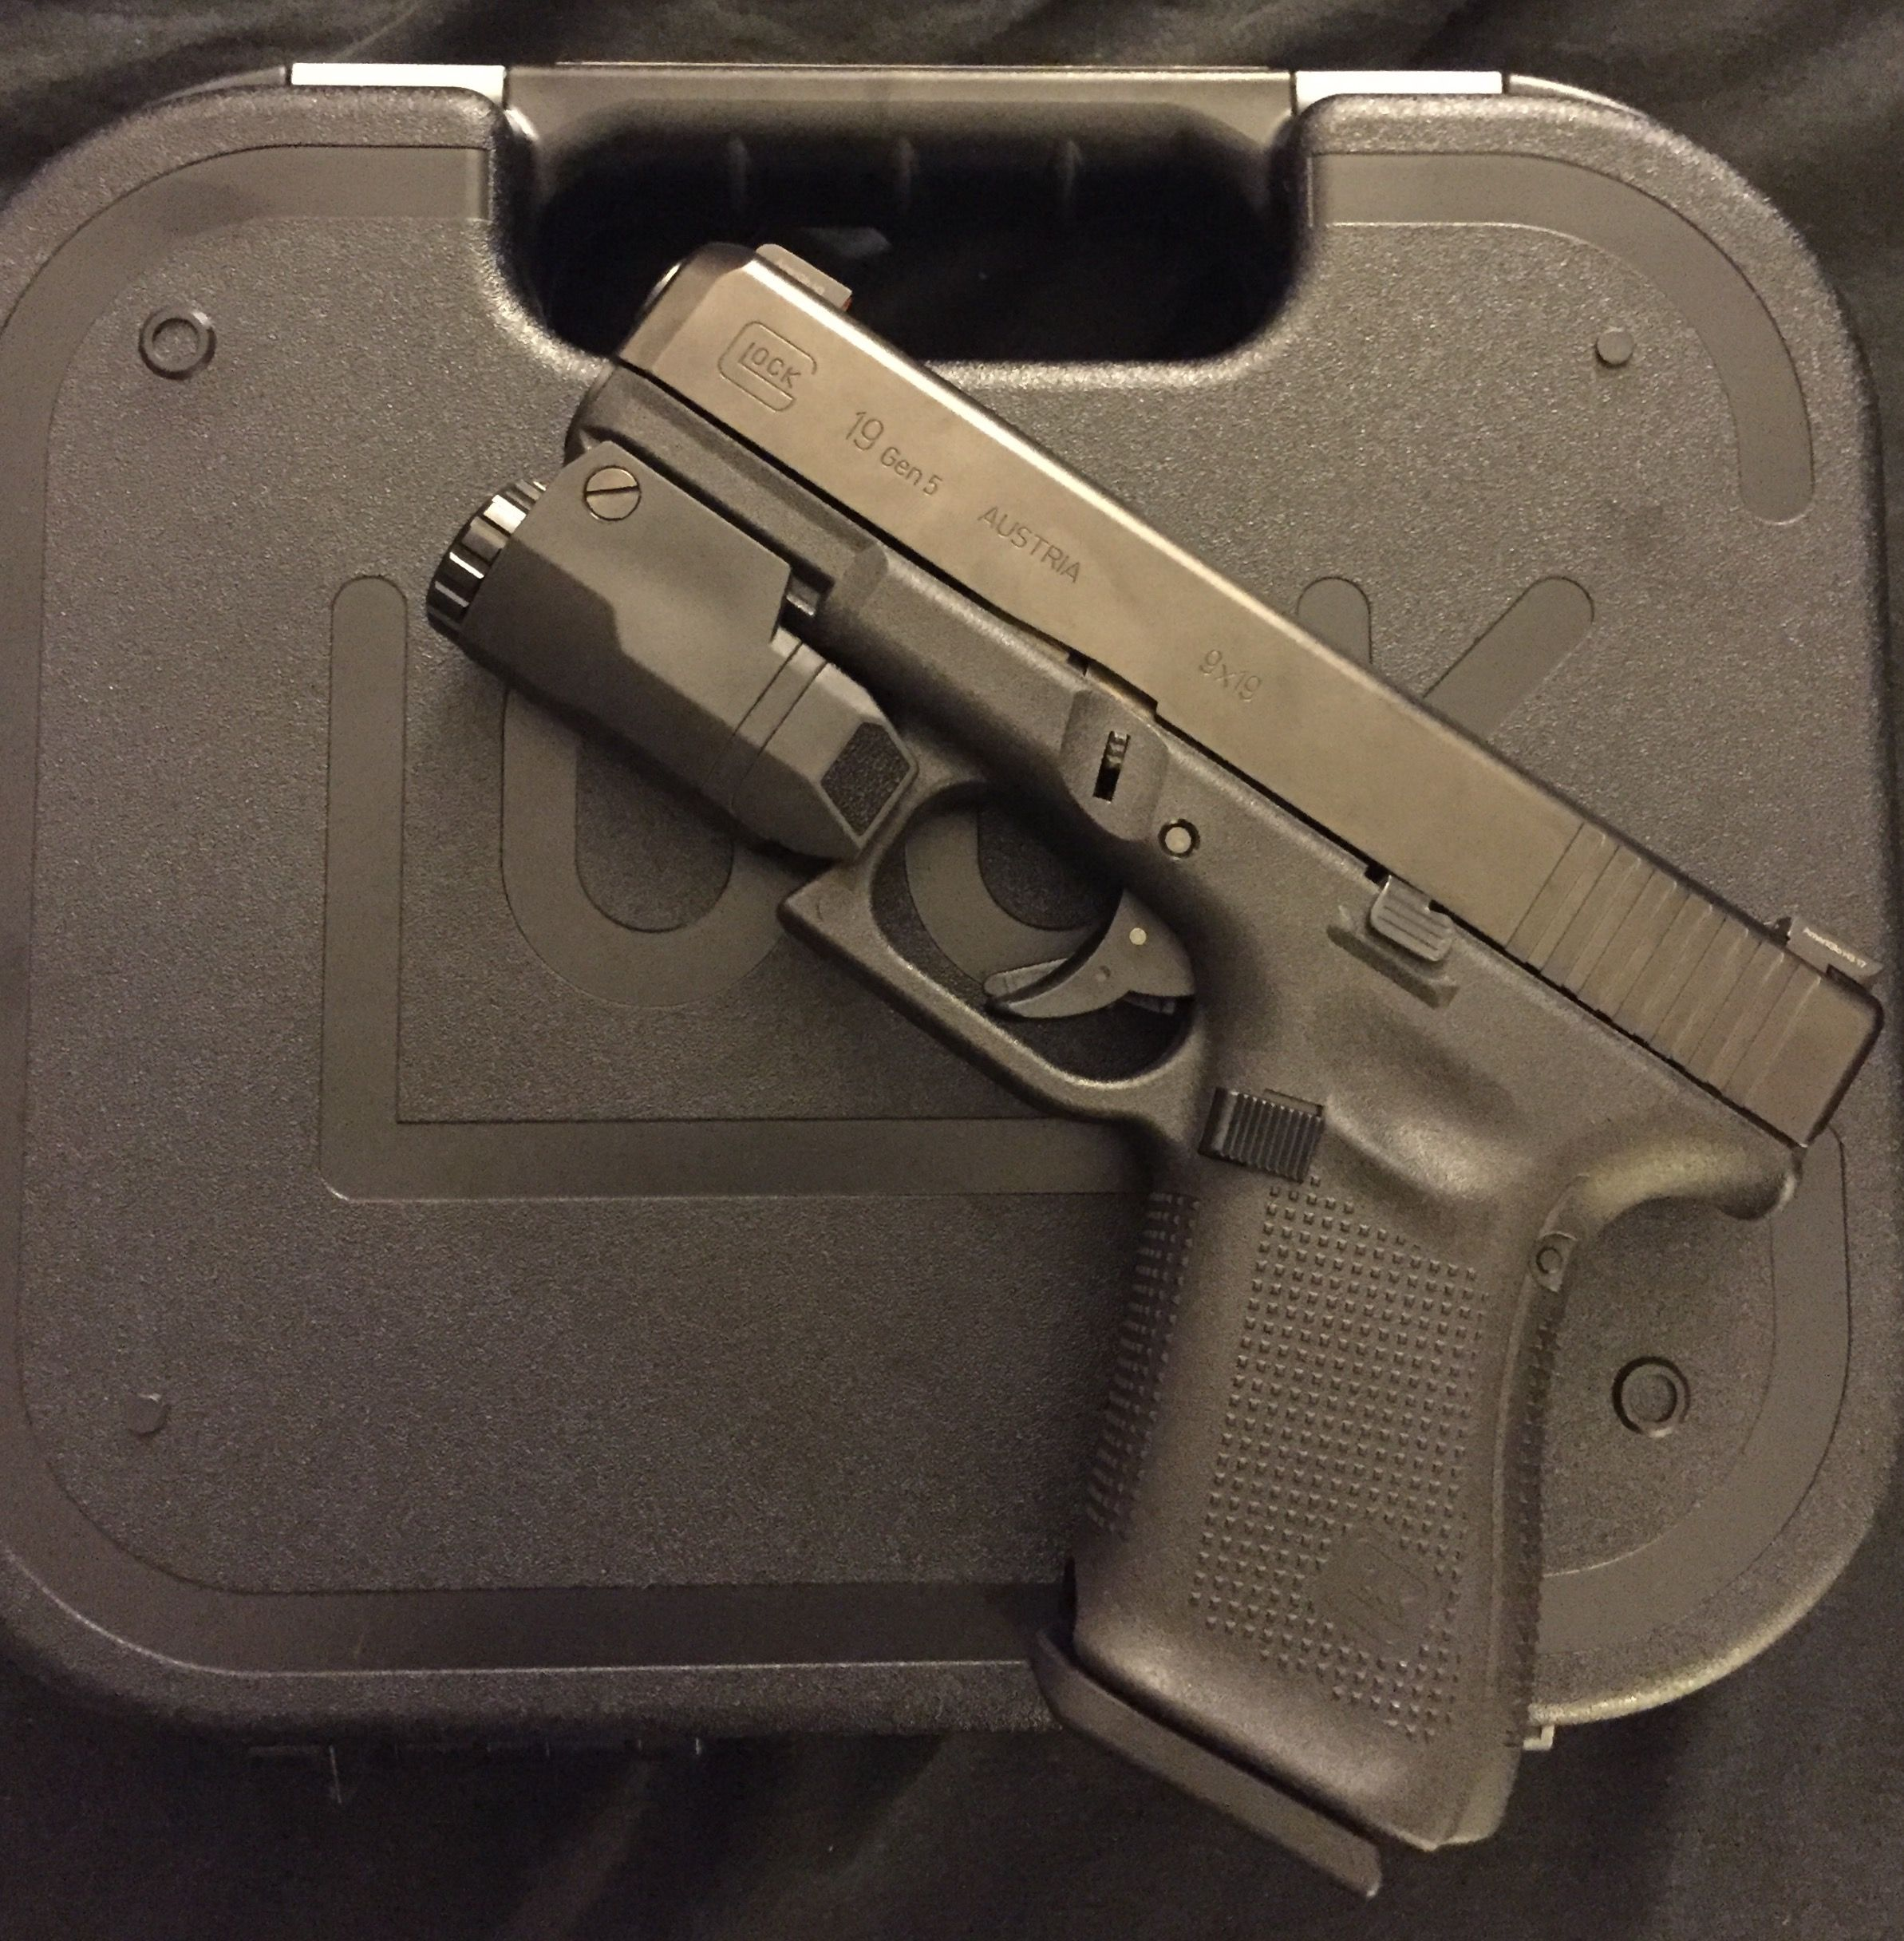 Glock 19 Gen 5 with Inforce APLc 😛 | 2A | Weapons guns